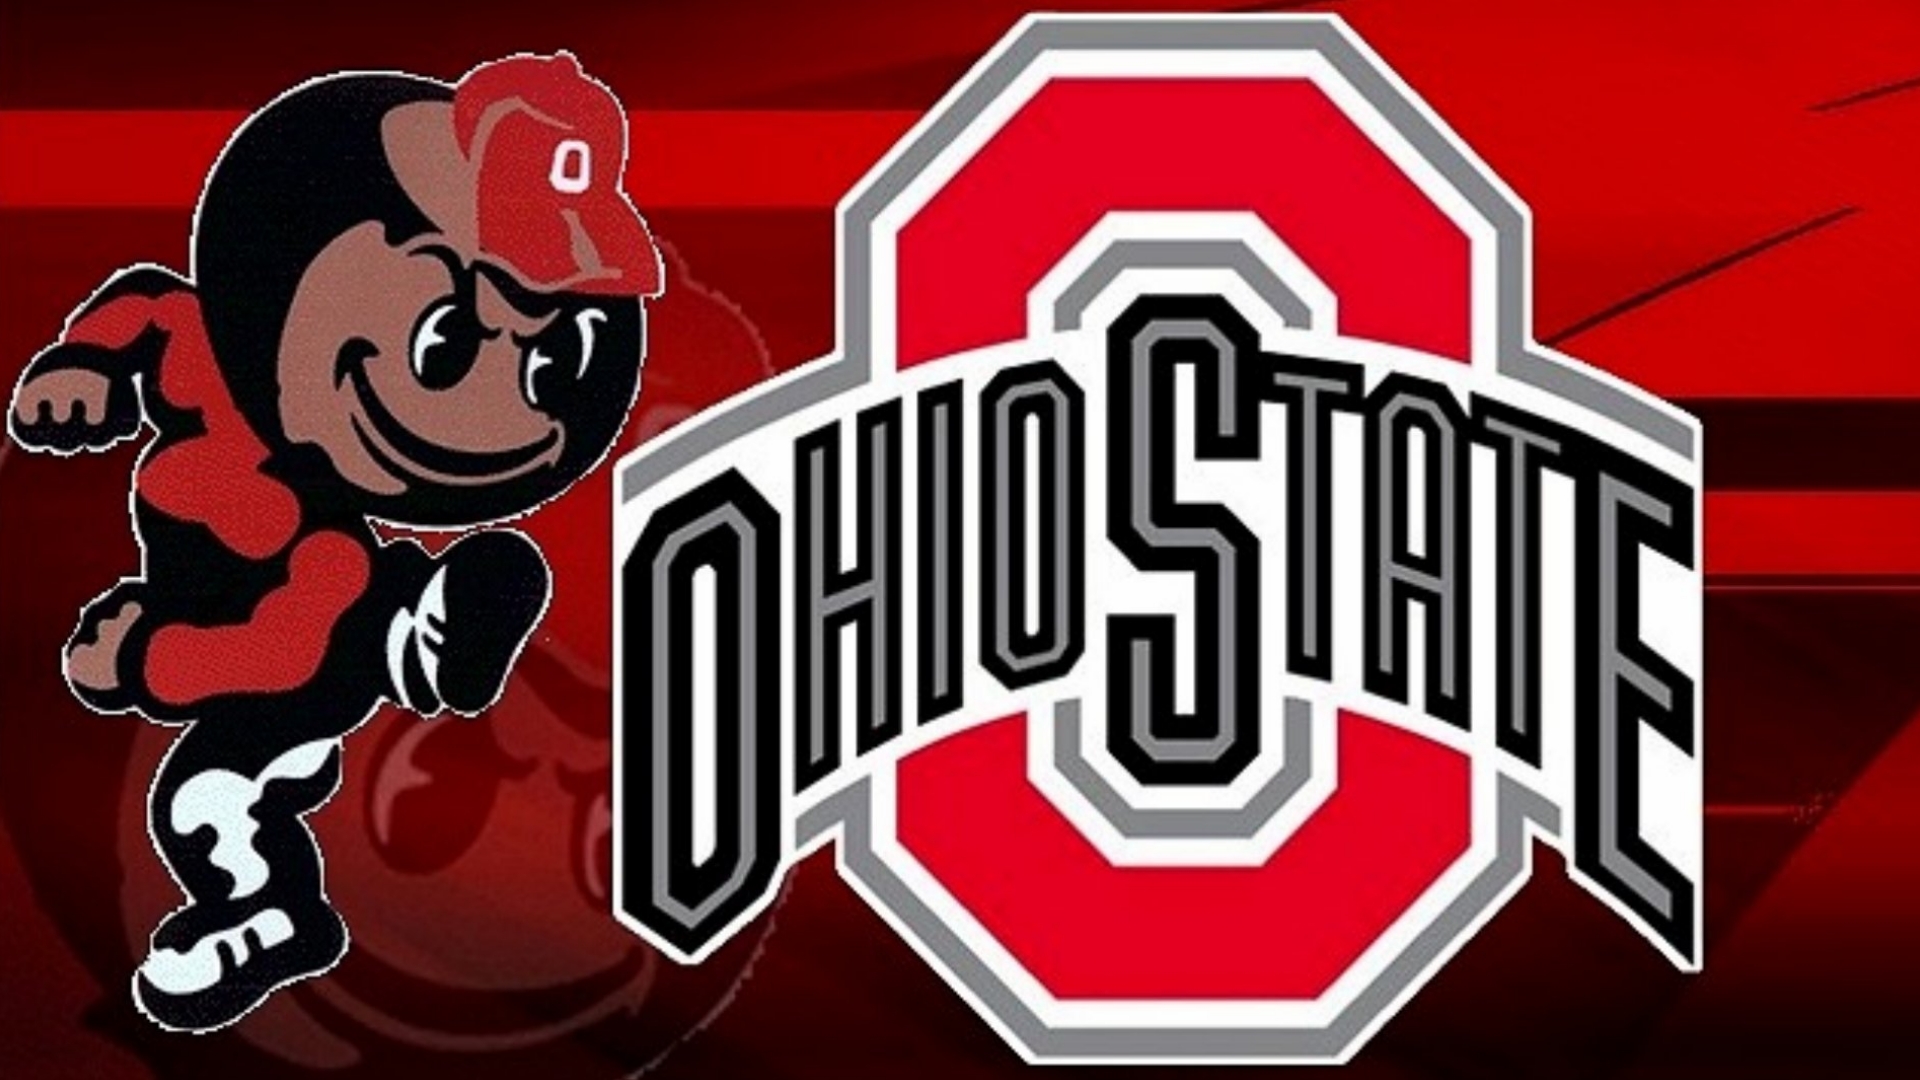 Ohio state buckeyes college football 2 wallpaper 1920x1080 ohio state buckeyes college football 2 wallpaper 1920x1080 210955 wallpaperup voltagebd Choice Image